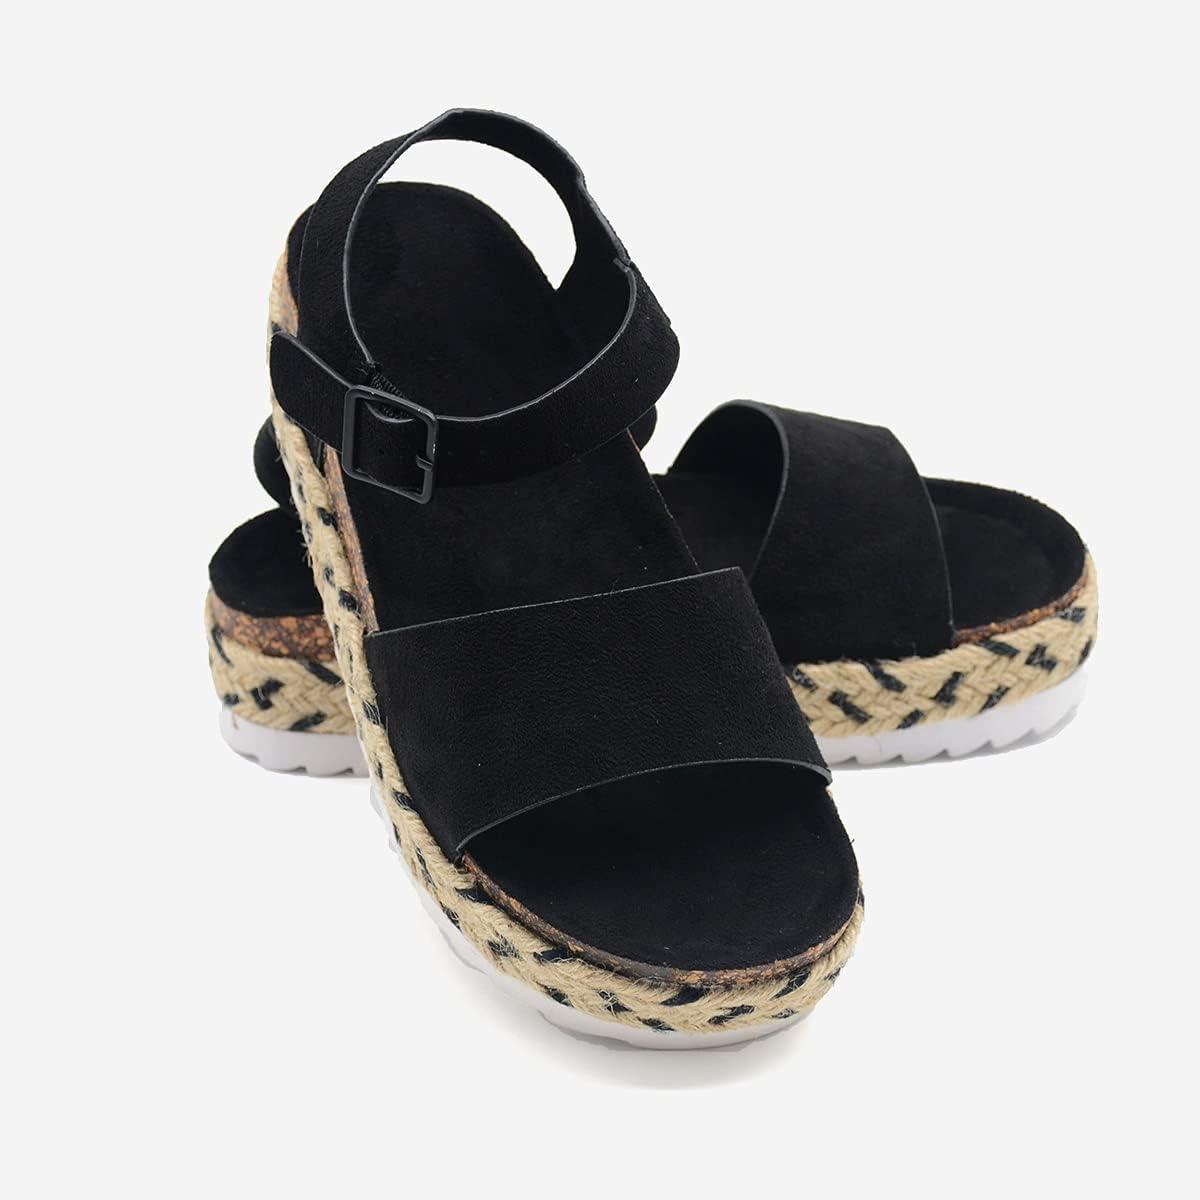 RAGEFIVE Slip On Wedge Sandals for Summer Casual Women Overseas parallel import regular Max 87% OFF item Espadrill